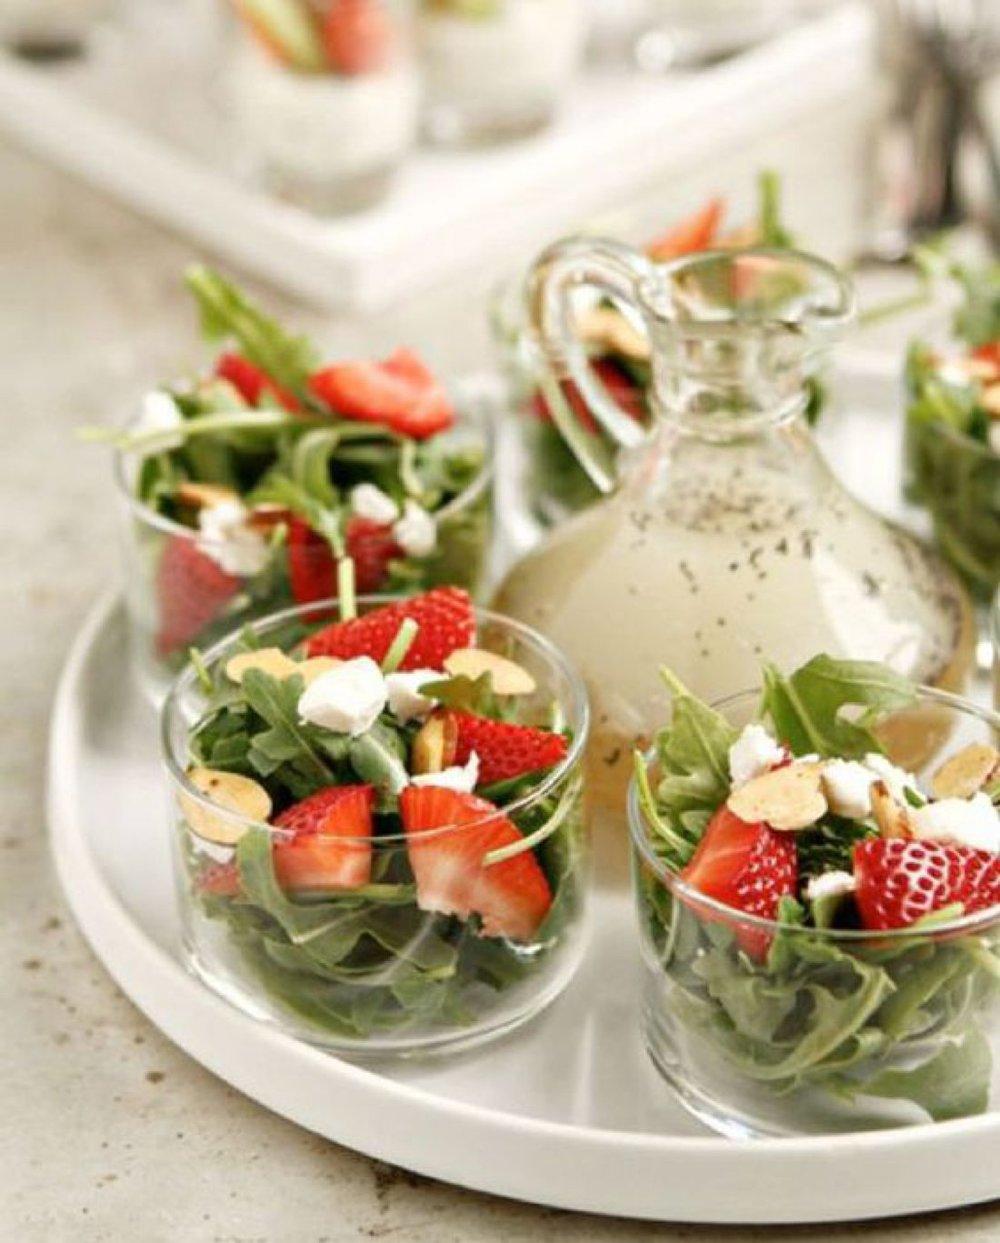 coco-lane-wedding-food-bowl_0003.jpg